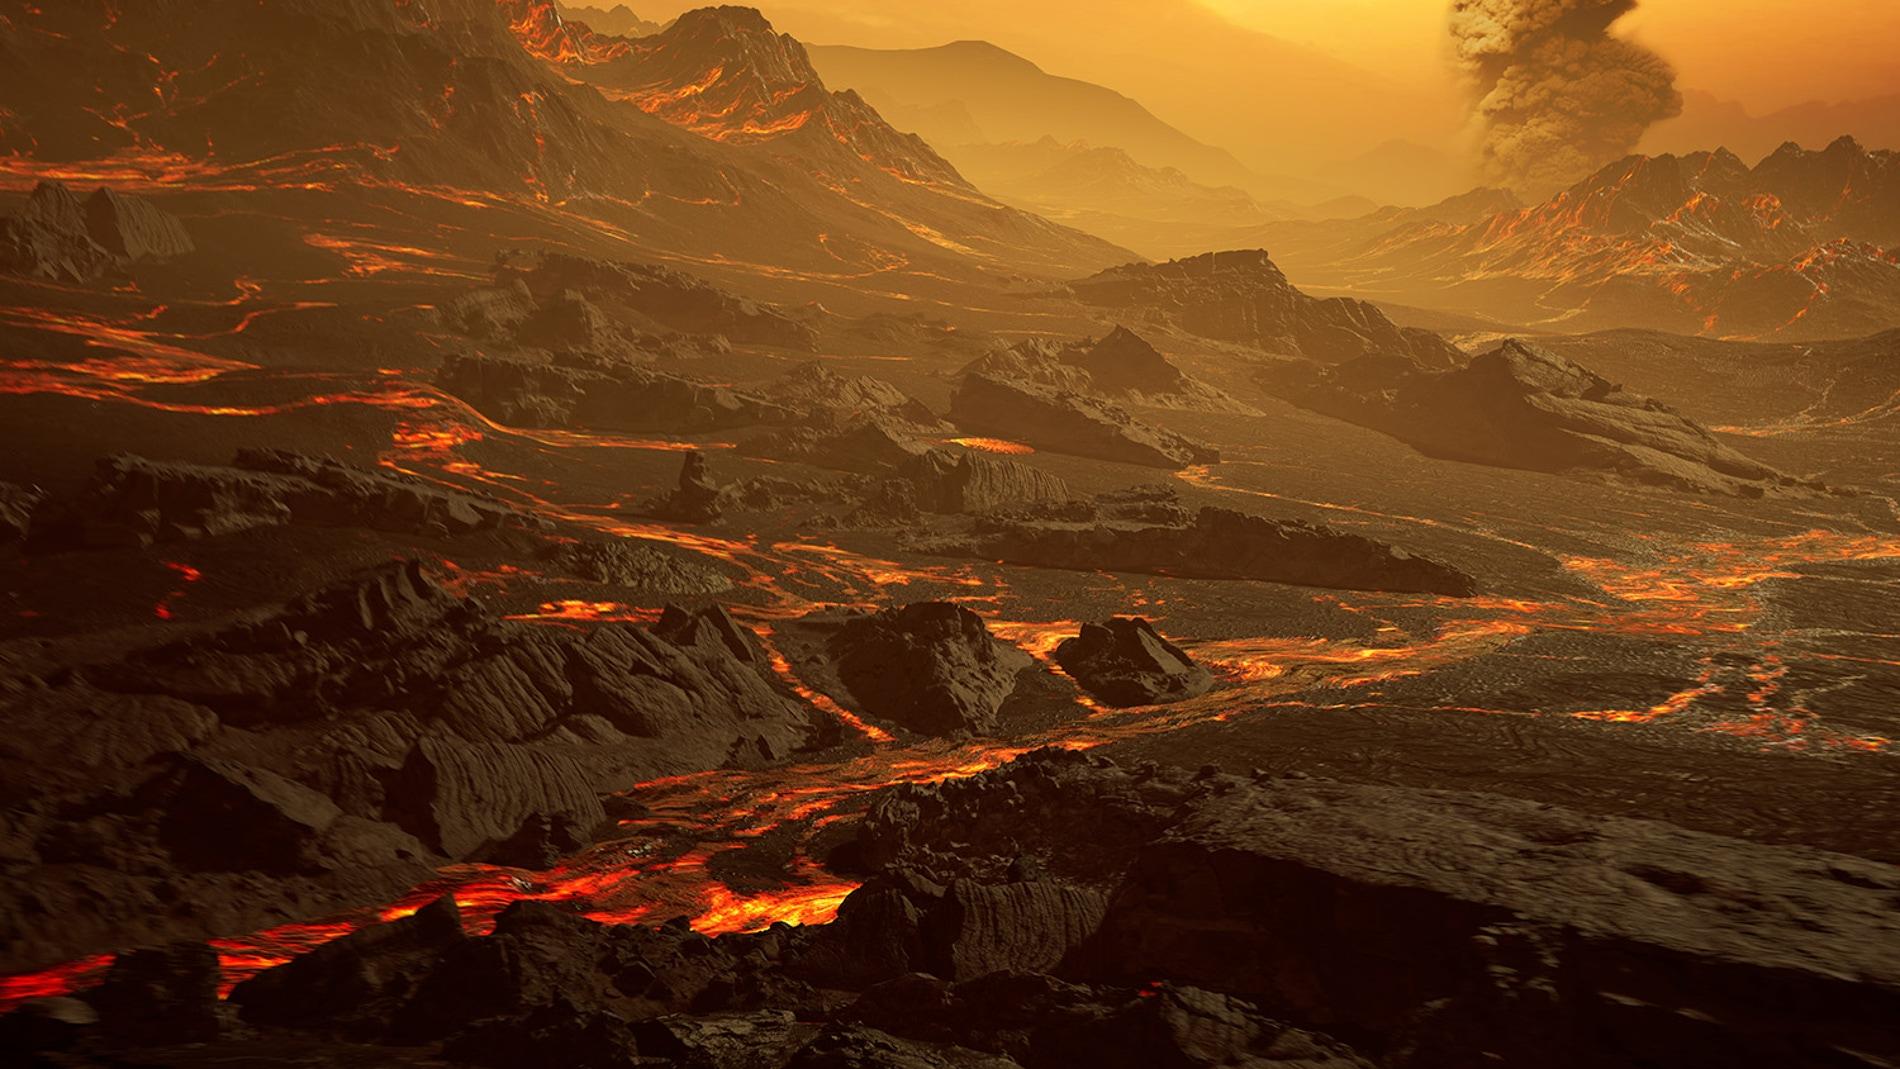 Descubierta una cercana supertierra ideal para la investigacion atmosferica